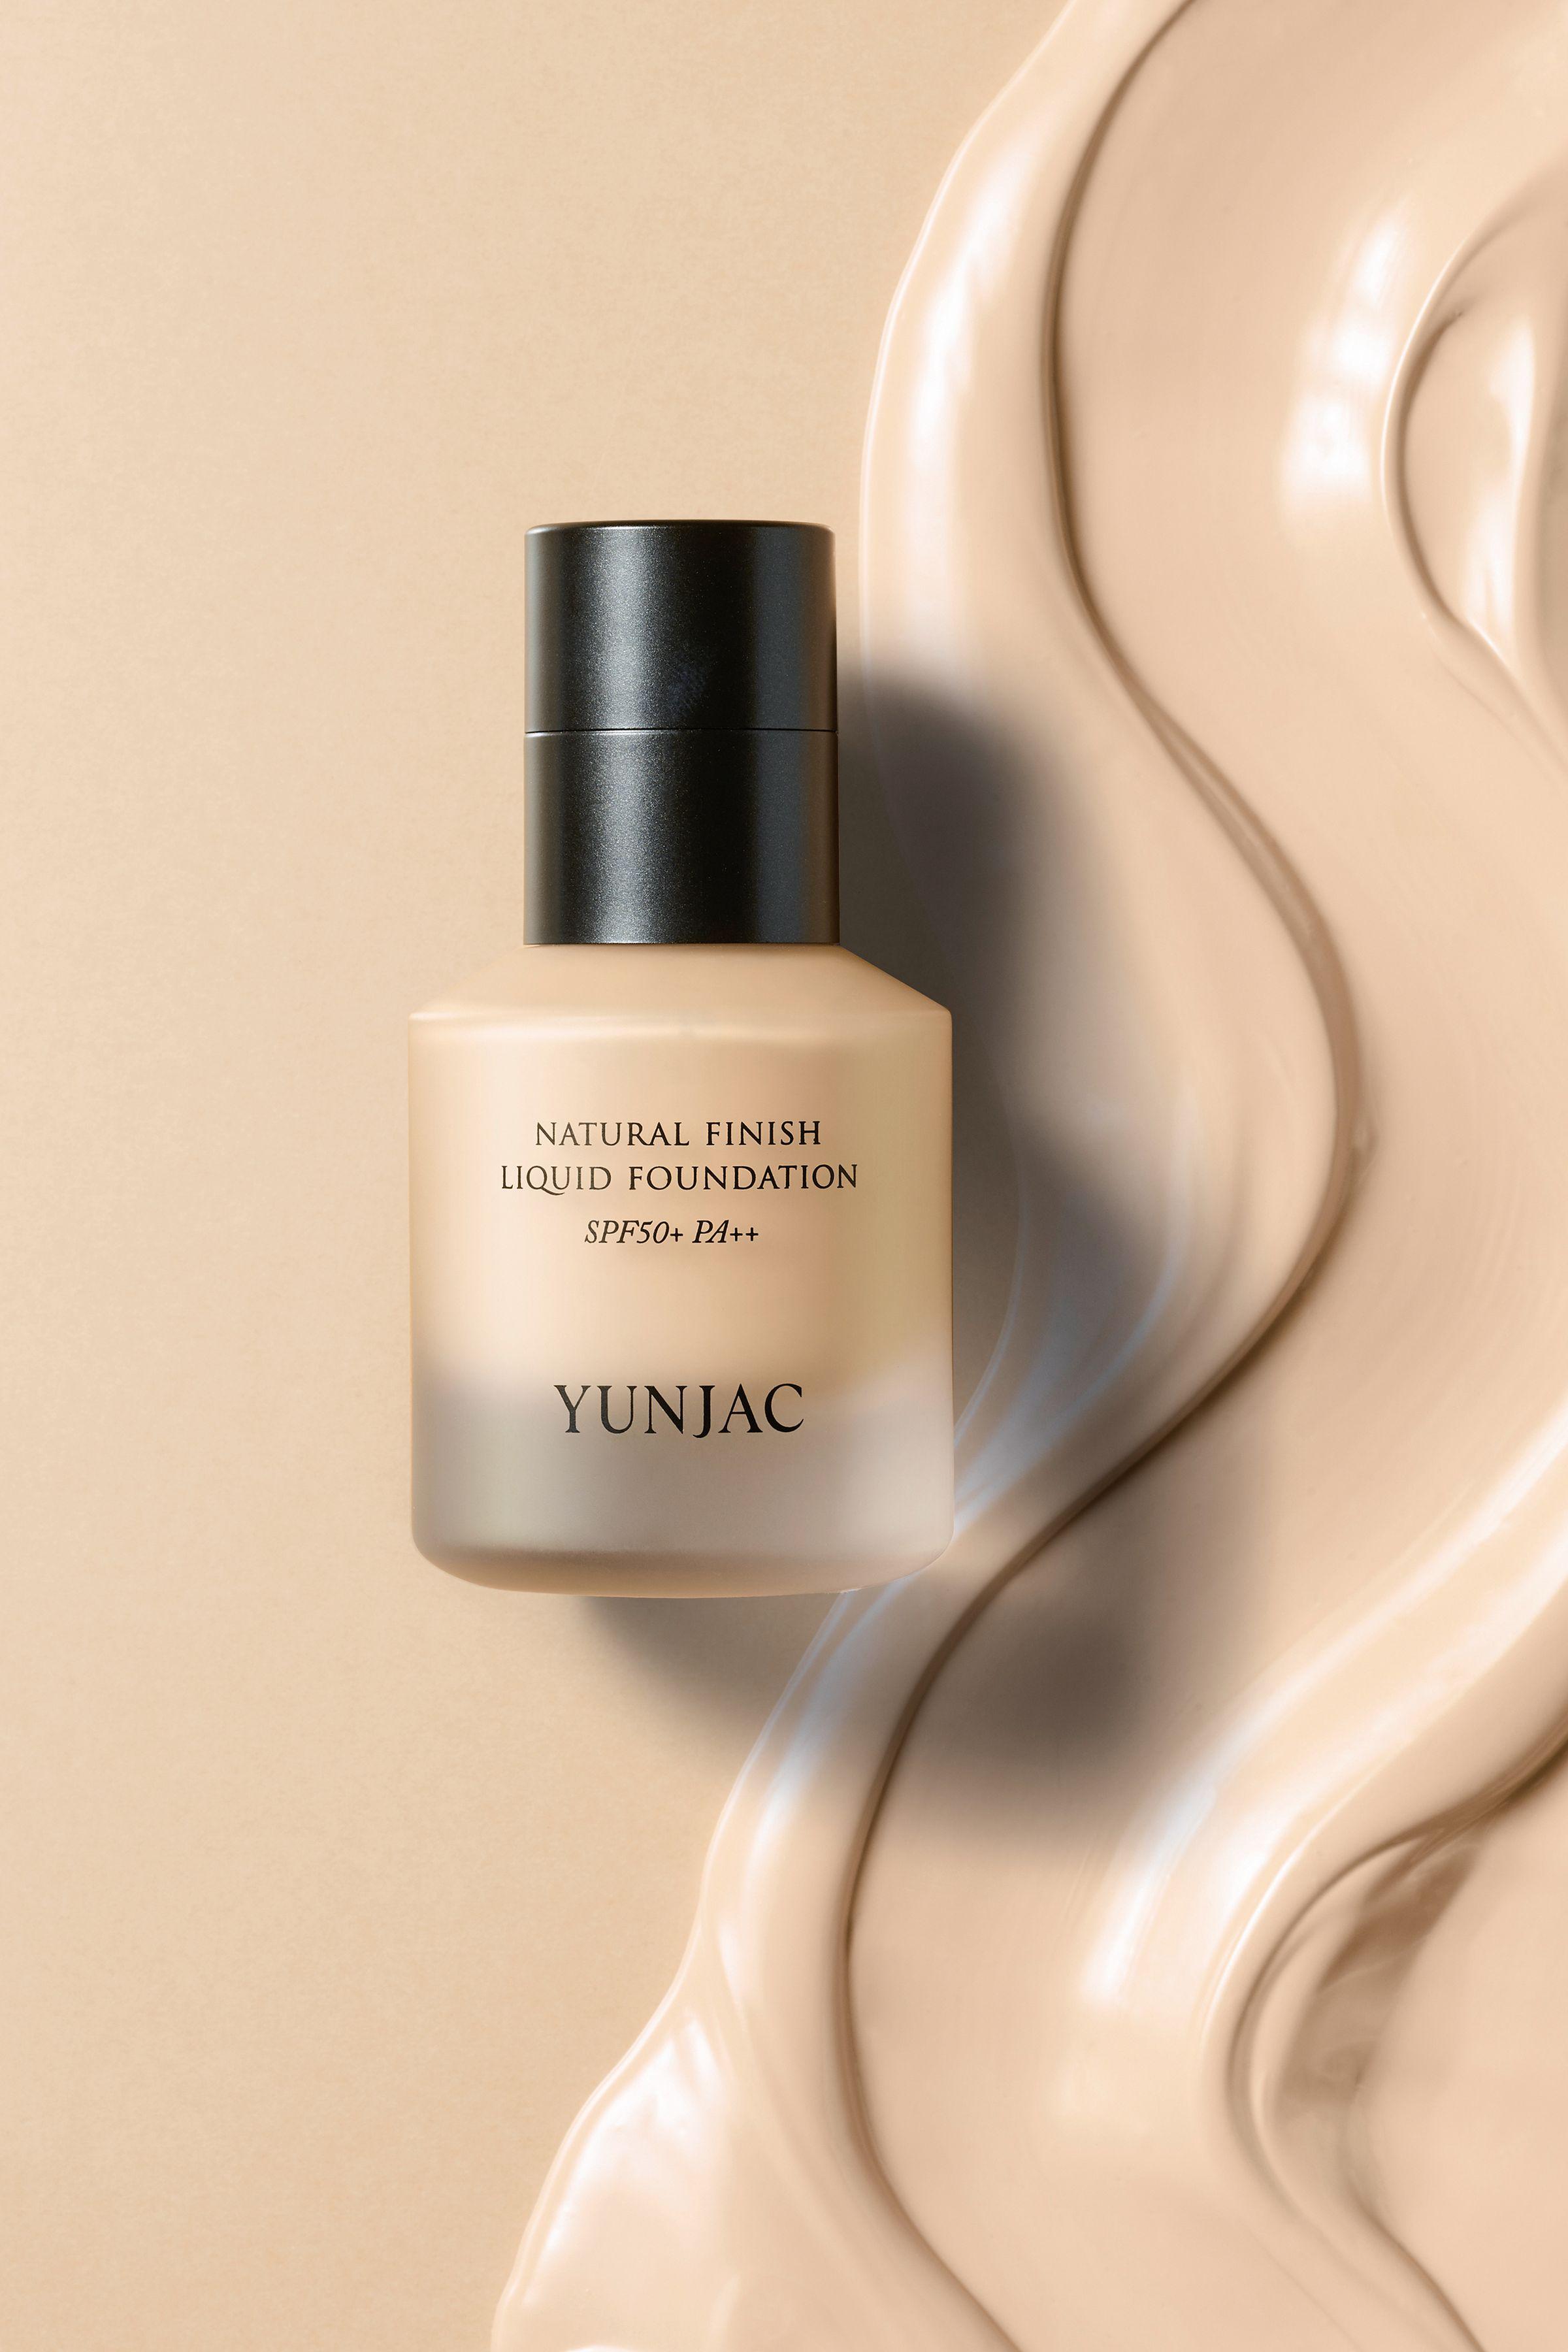 Yunjac Natural Finish Liquid Foundation packaging design still life photograph